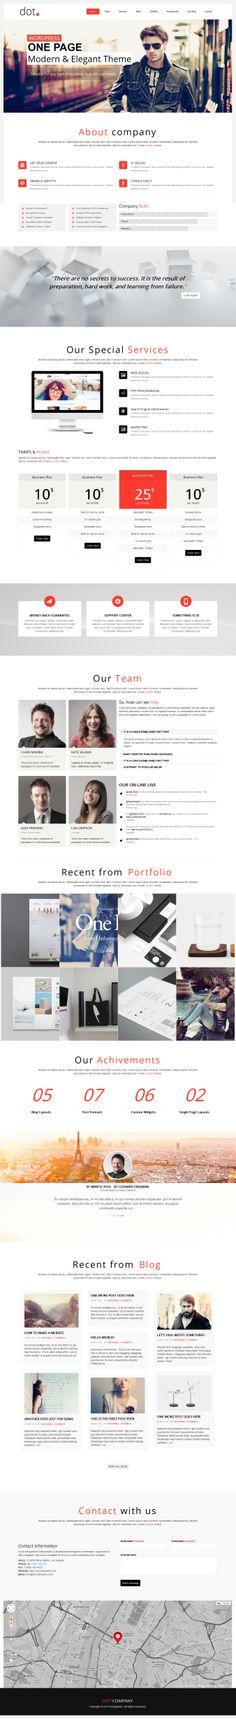 DOT - Creative One Page Multi-Purpose Theme #portfolio #presentation